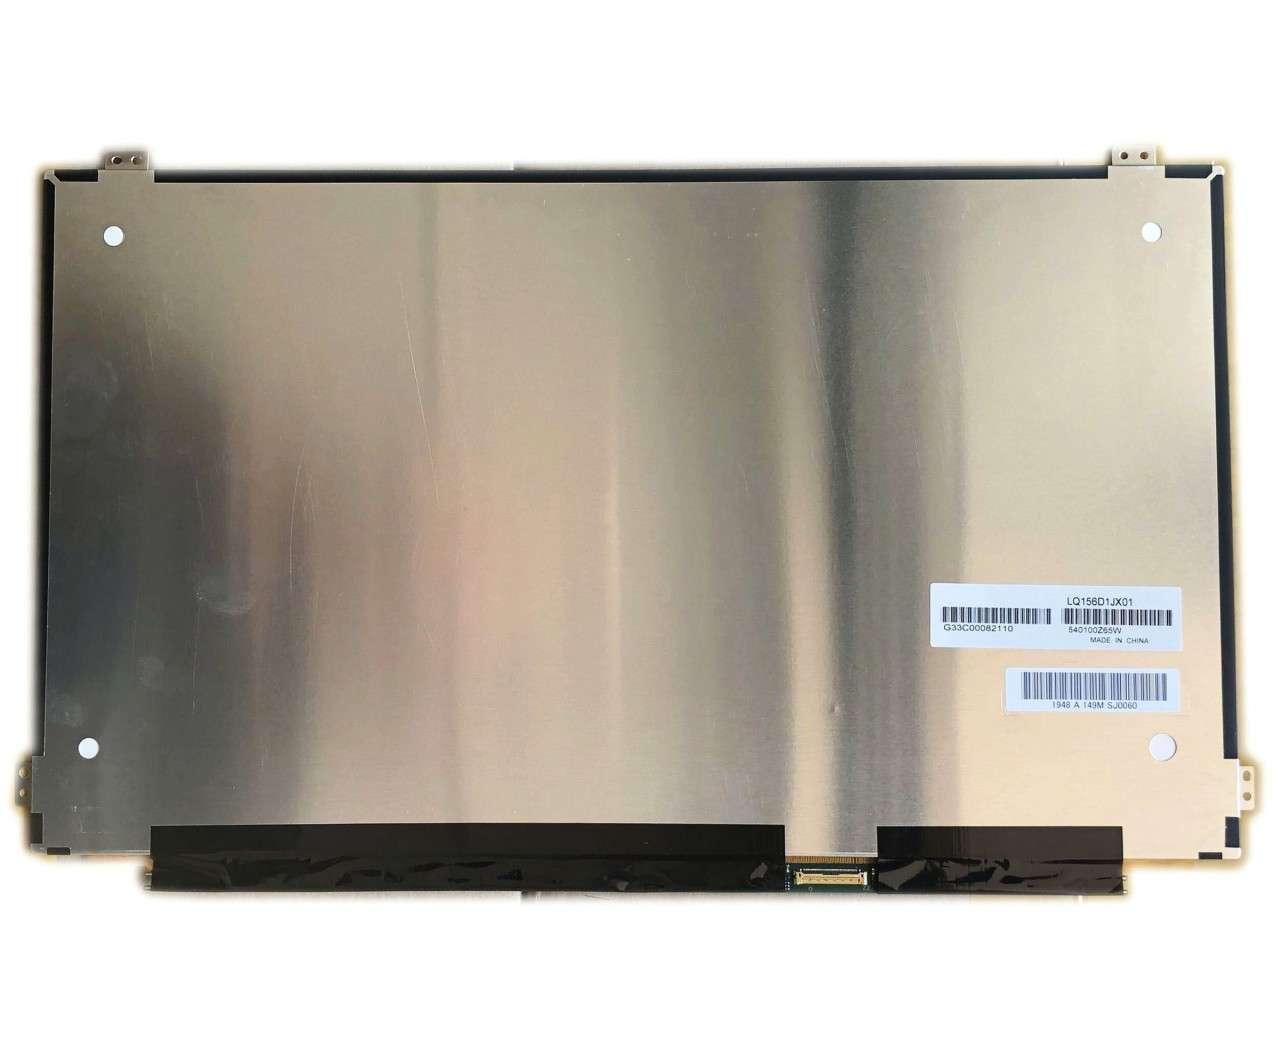 Display laptop Toshiba Satellite Radius P55W-C Ecran 15.6 3840x2160 UHD 4K 40 pini EDP imagine powerlaptop.ro 2021